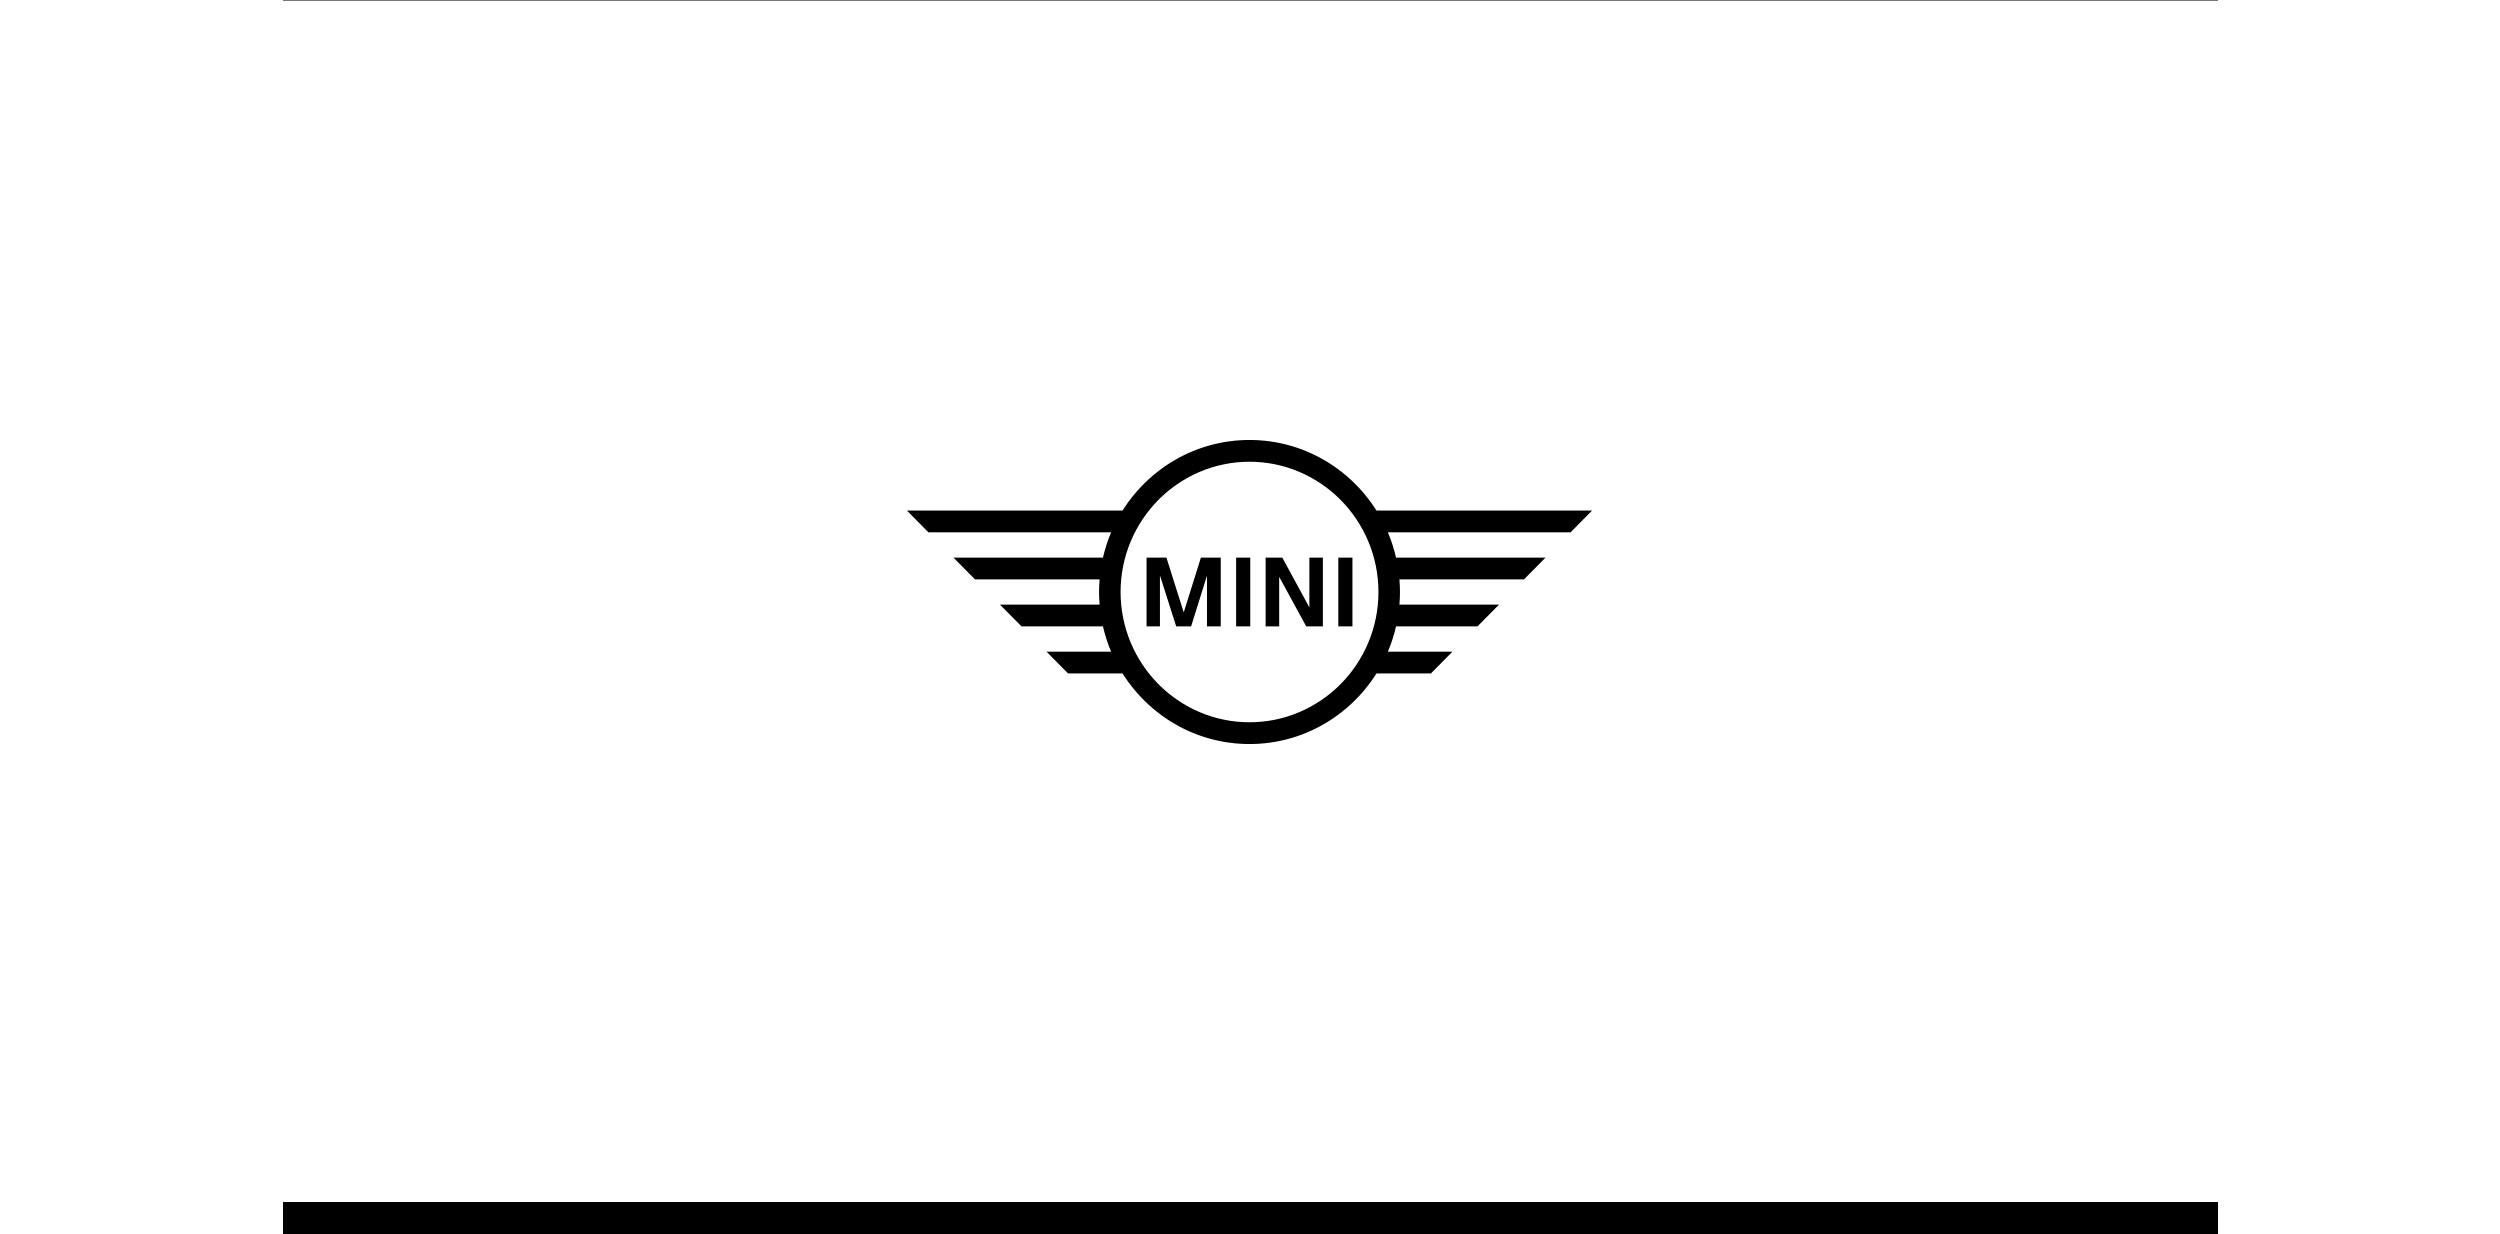 Kkld Mini Mini New Corporate Identity Client